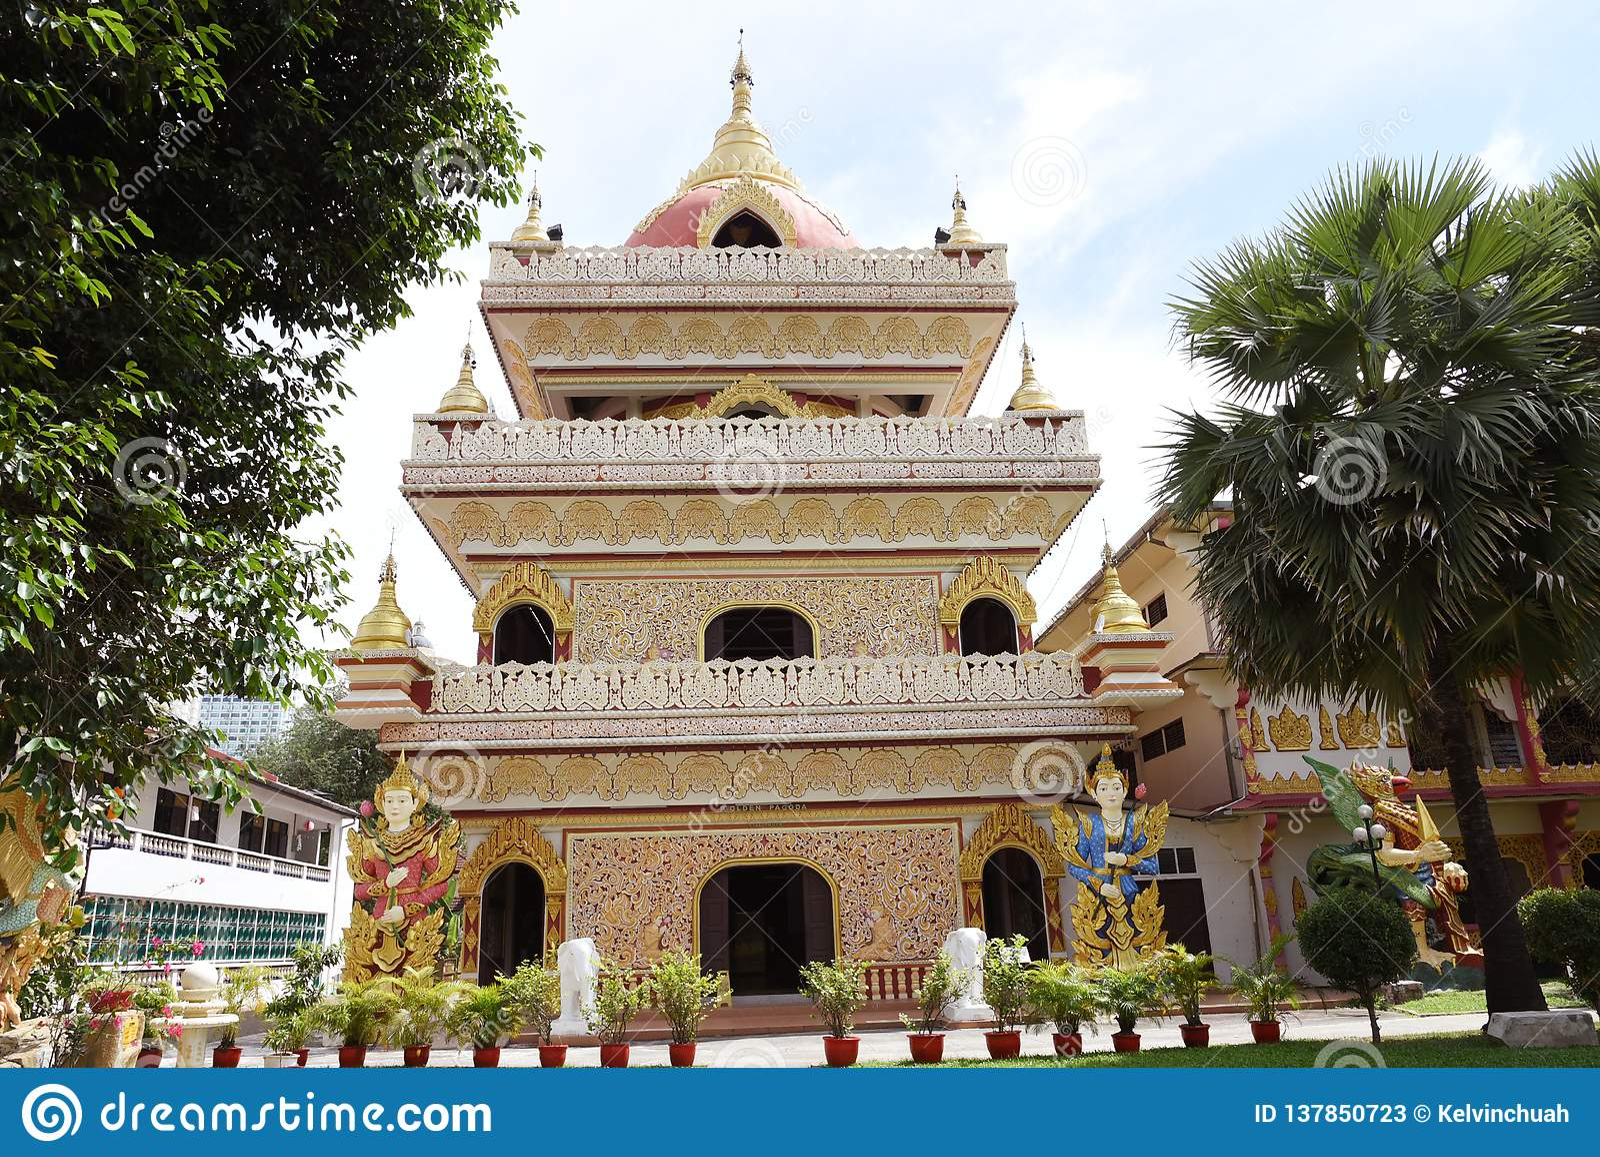 Templo do birmanês em Penang, Malásia